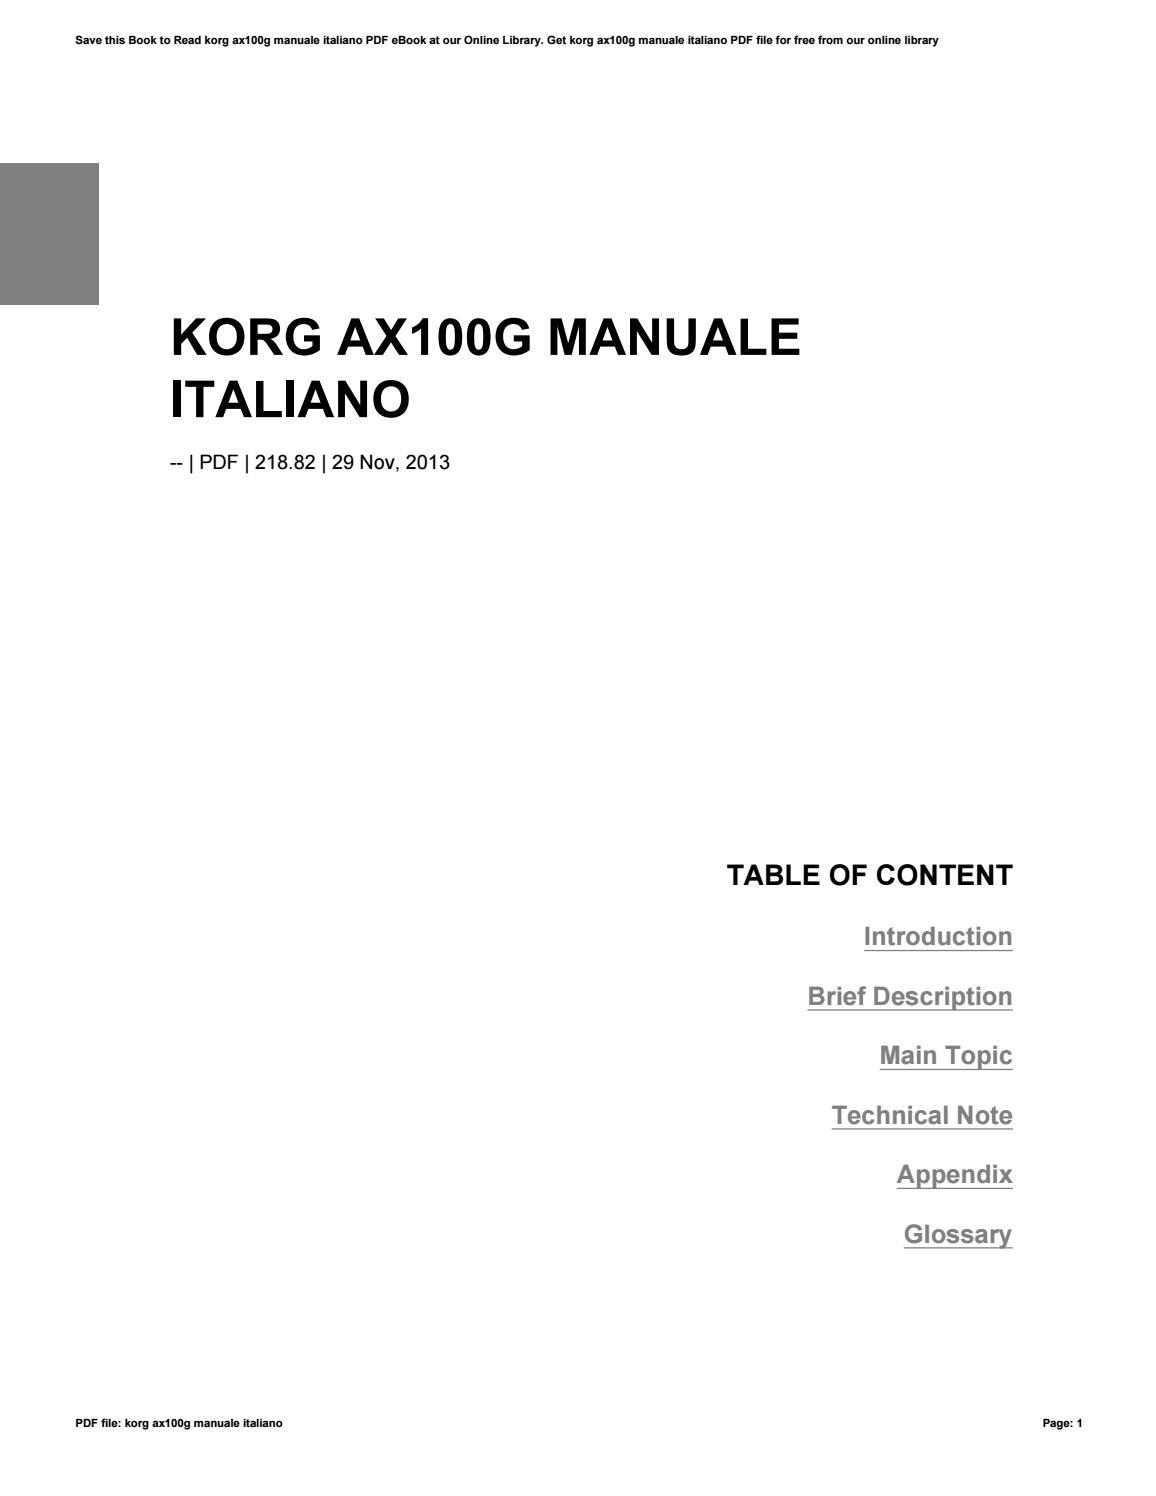 Korg M1 Manuale italiano free